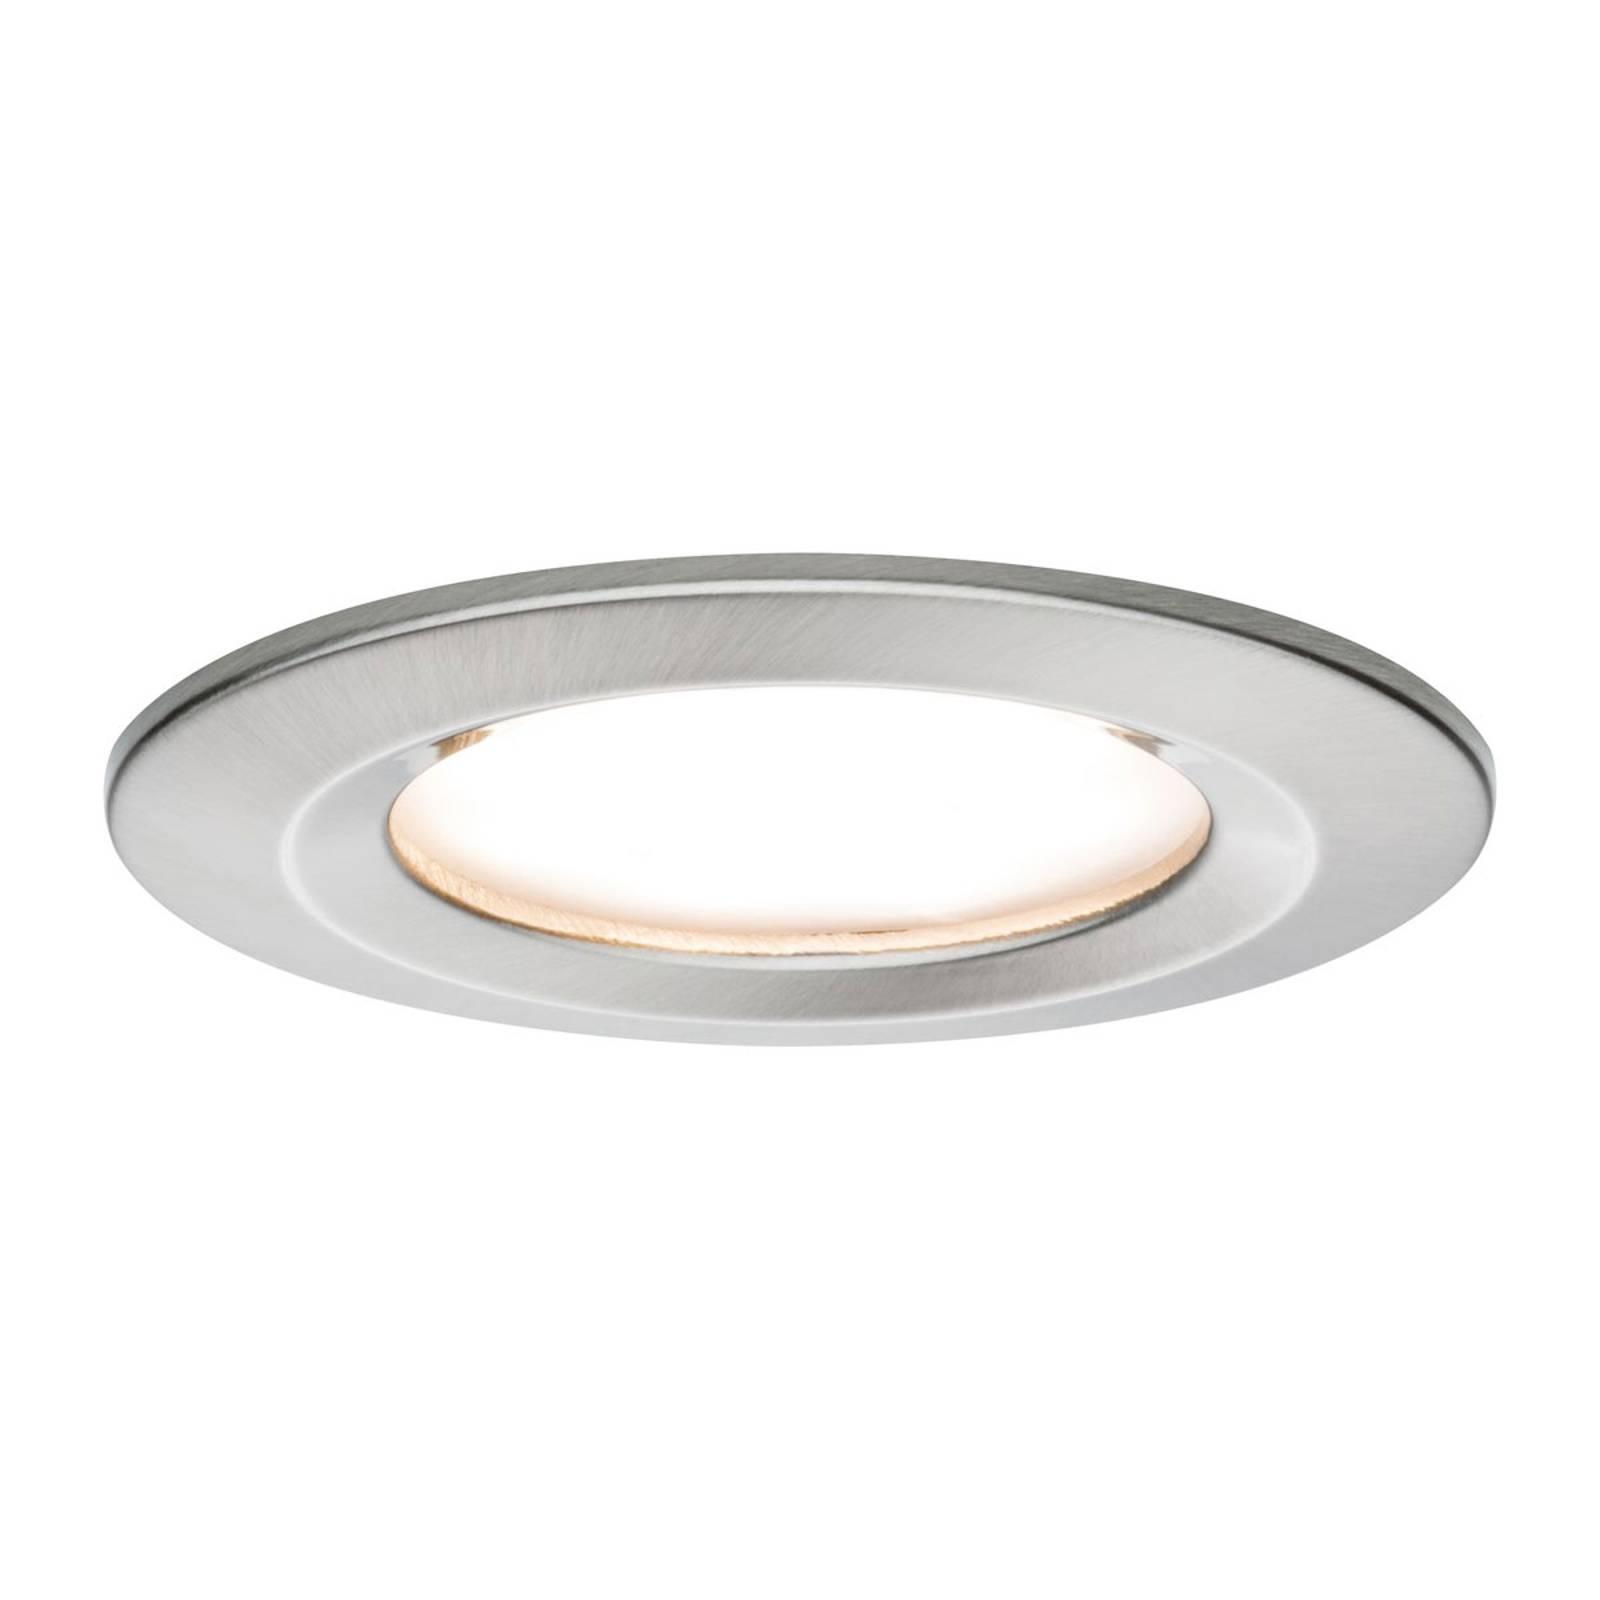 Paulmann Nova Coin faretto LED tondo, ferro